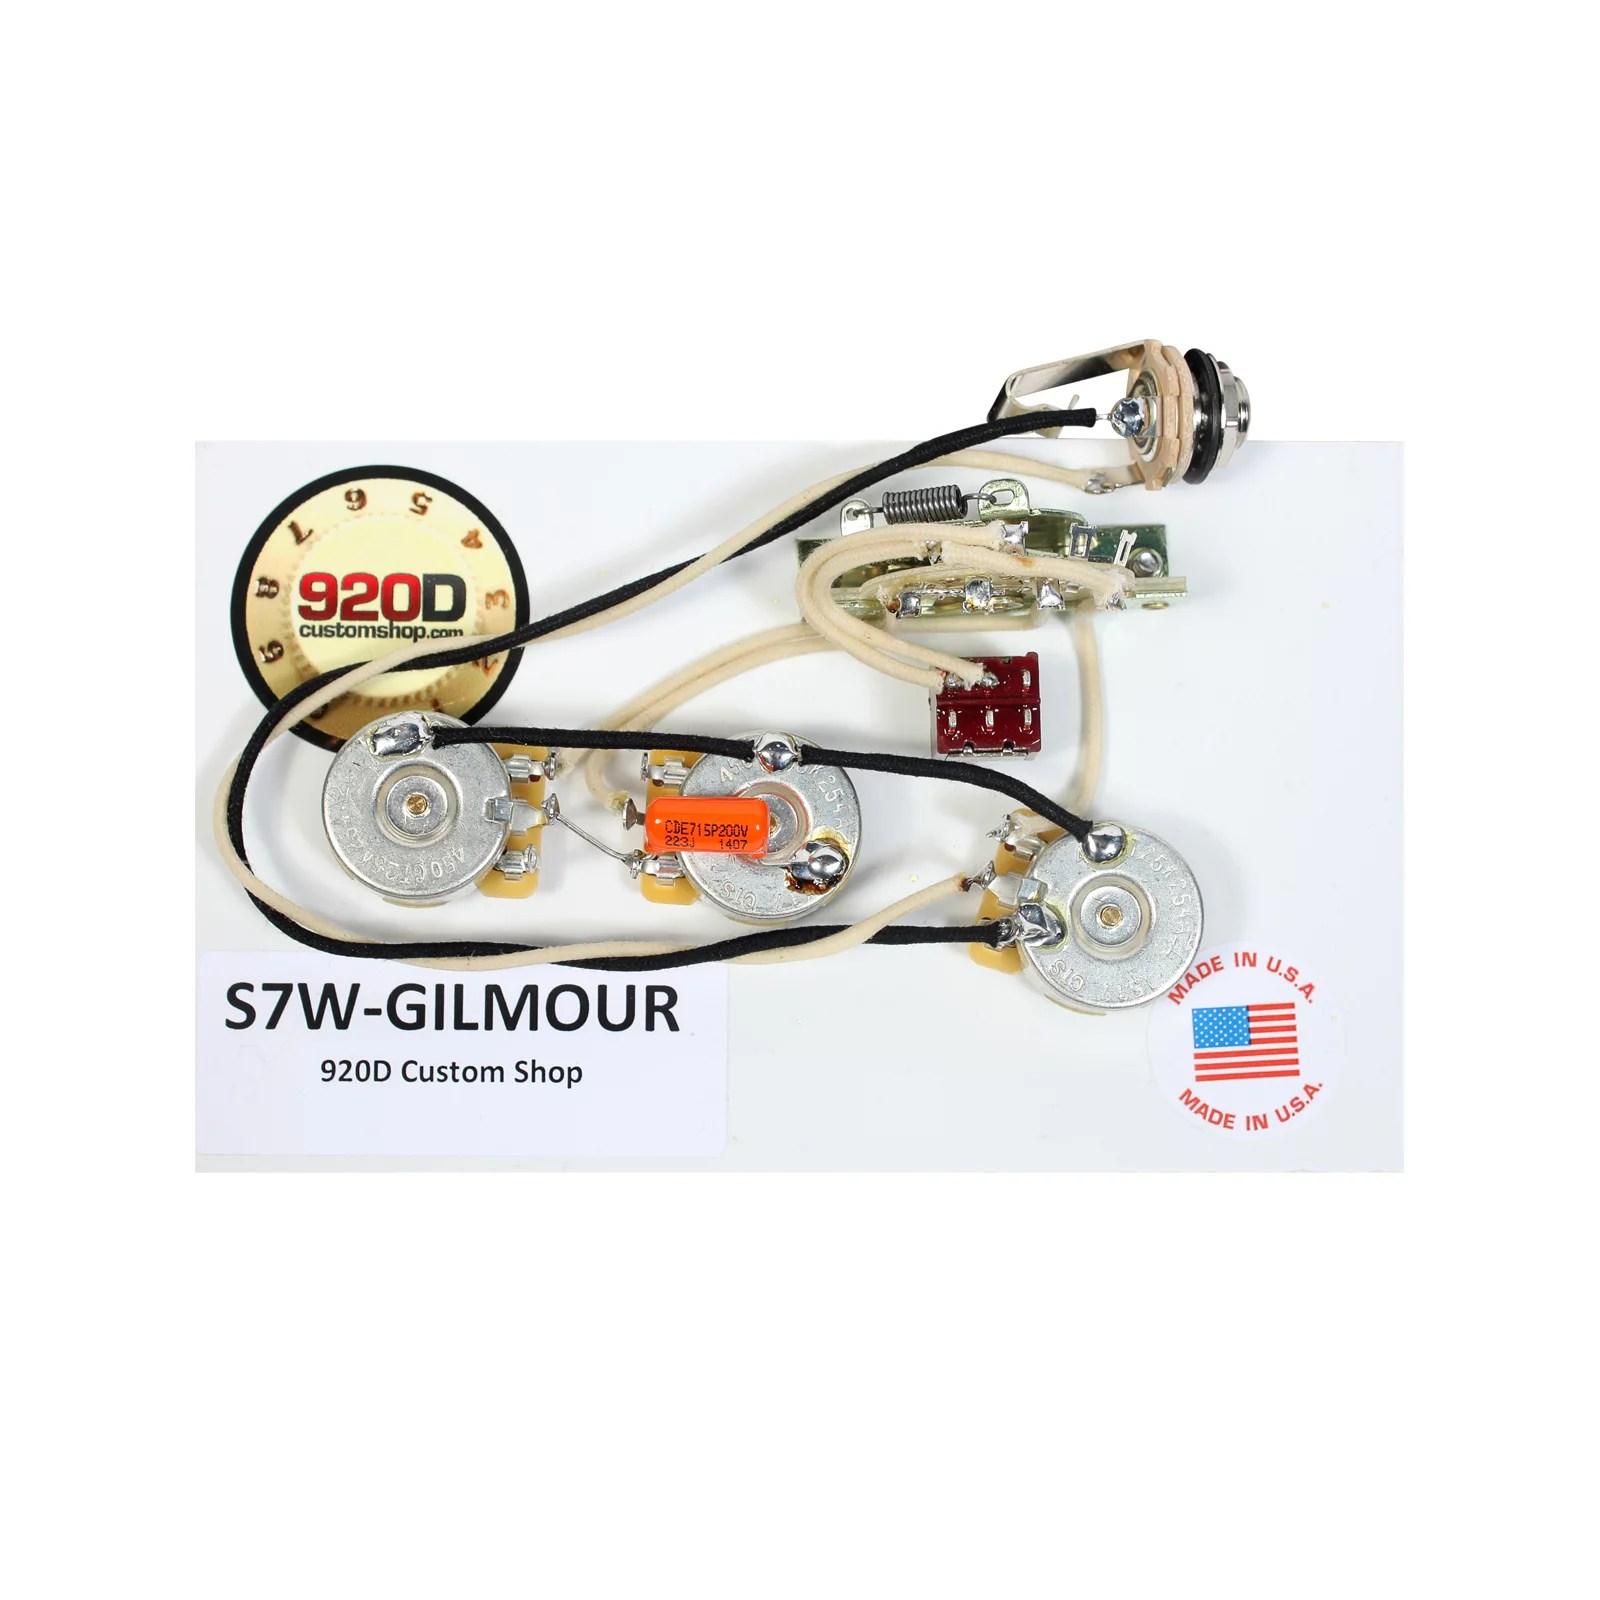 hight resolution of fender strat stratocaster david gilmour 7 way wiring harness mini fender strat stratocaster david gilmour 7